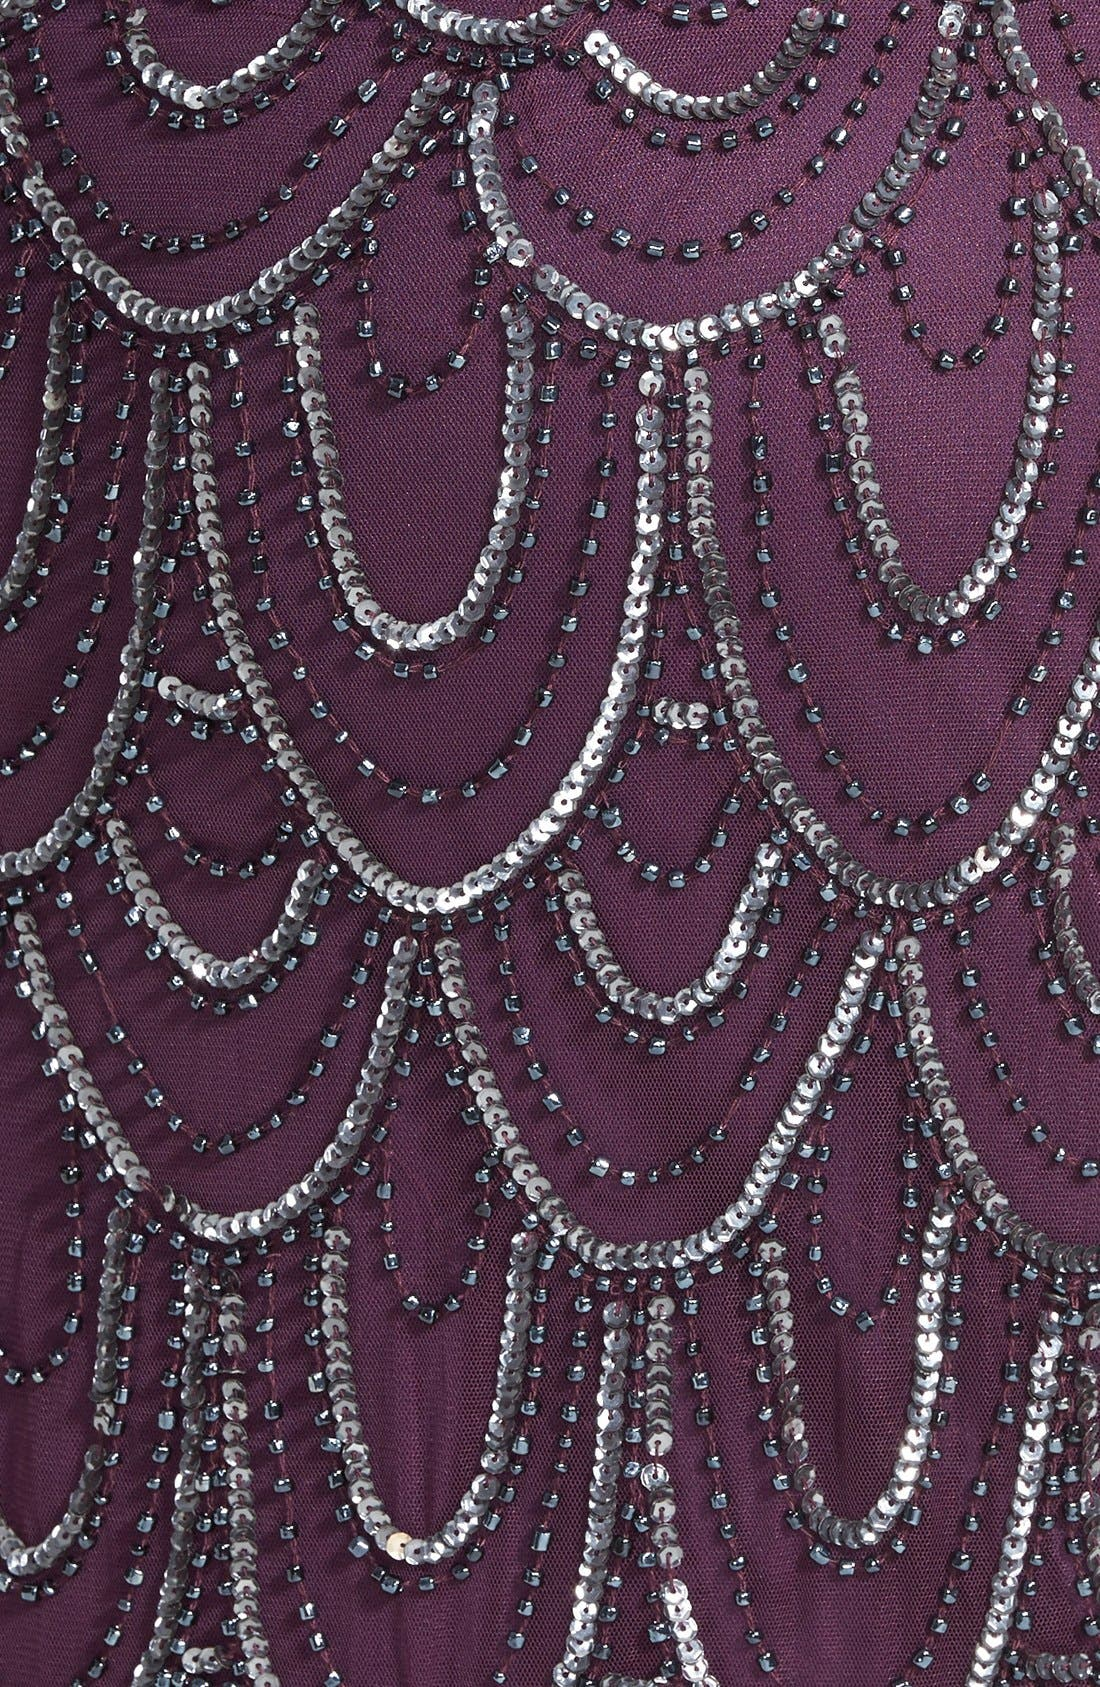 Beaded Sheath Dress,                             Alternate thumbnail 67, color,